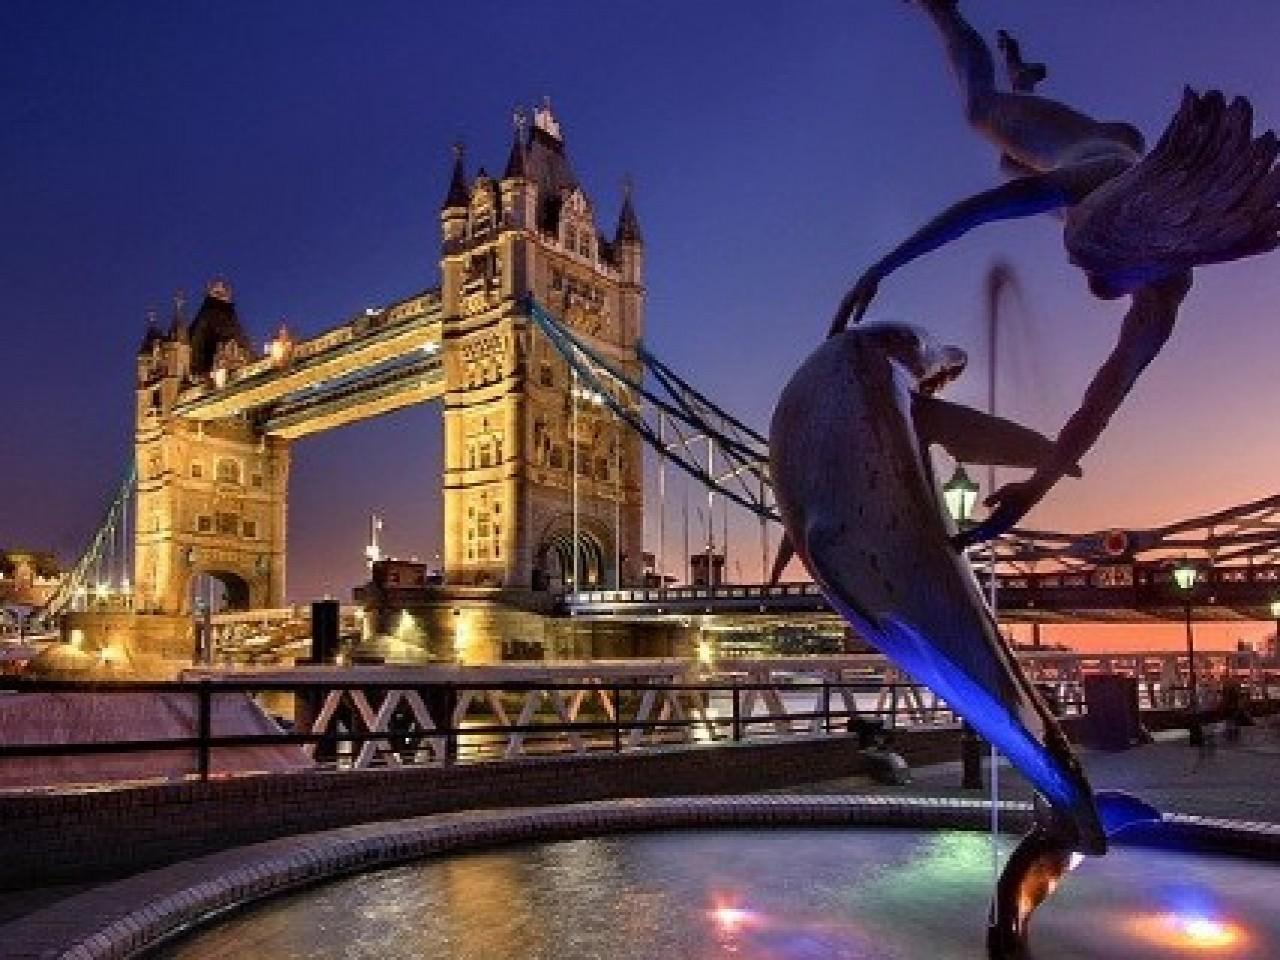 London +2370 hotel